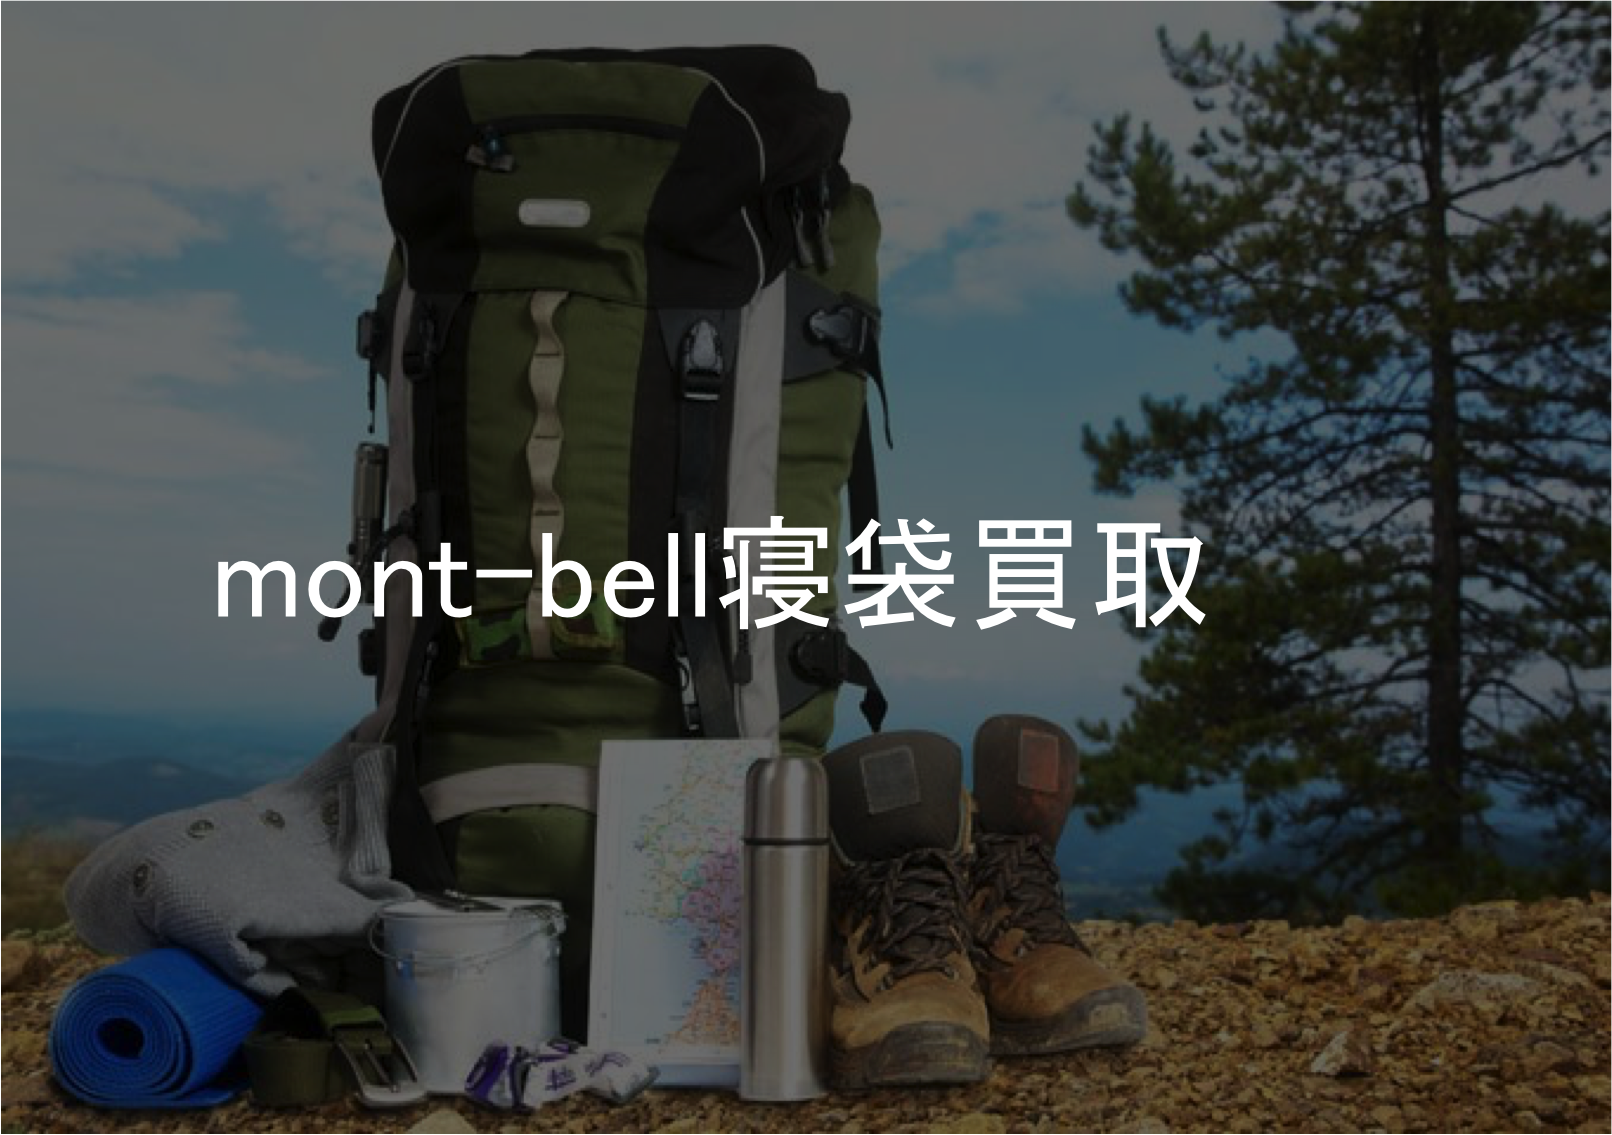 mont-bell 寝袋(シュラフ)買取なら